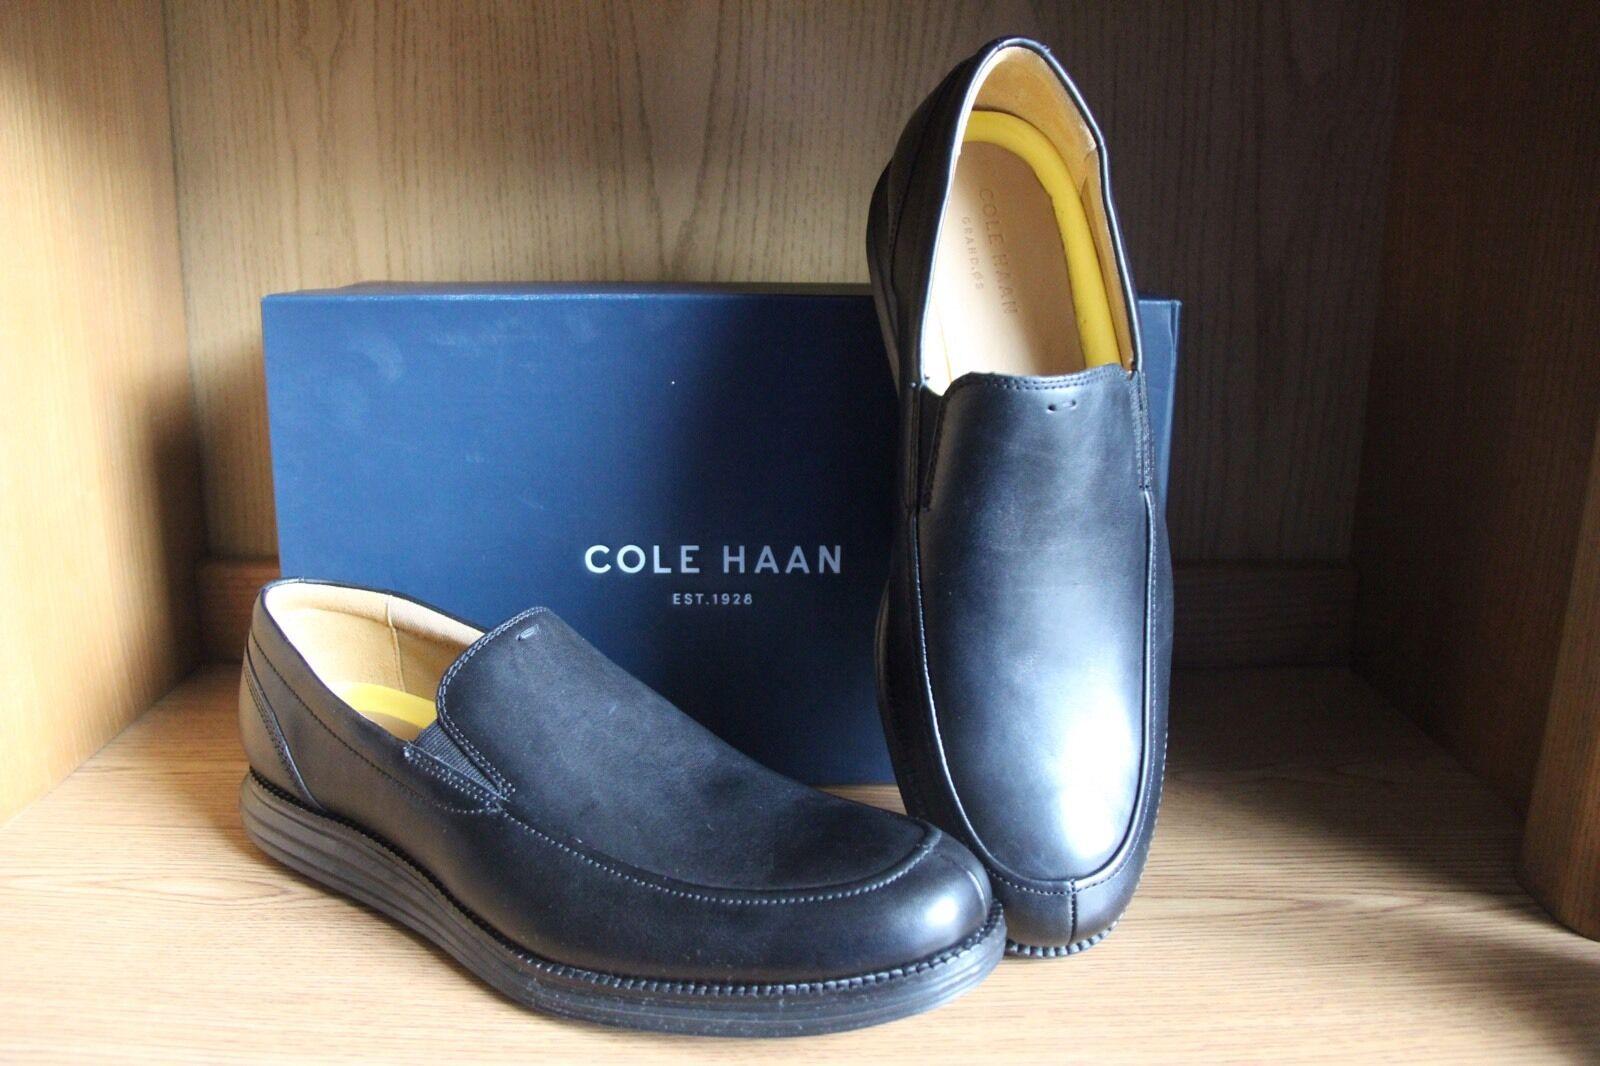 Cole Haan Original Grand Venetian Black Loafer Black Venetian Shoe Men Size 11.5  C20742 bc5281